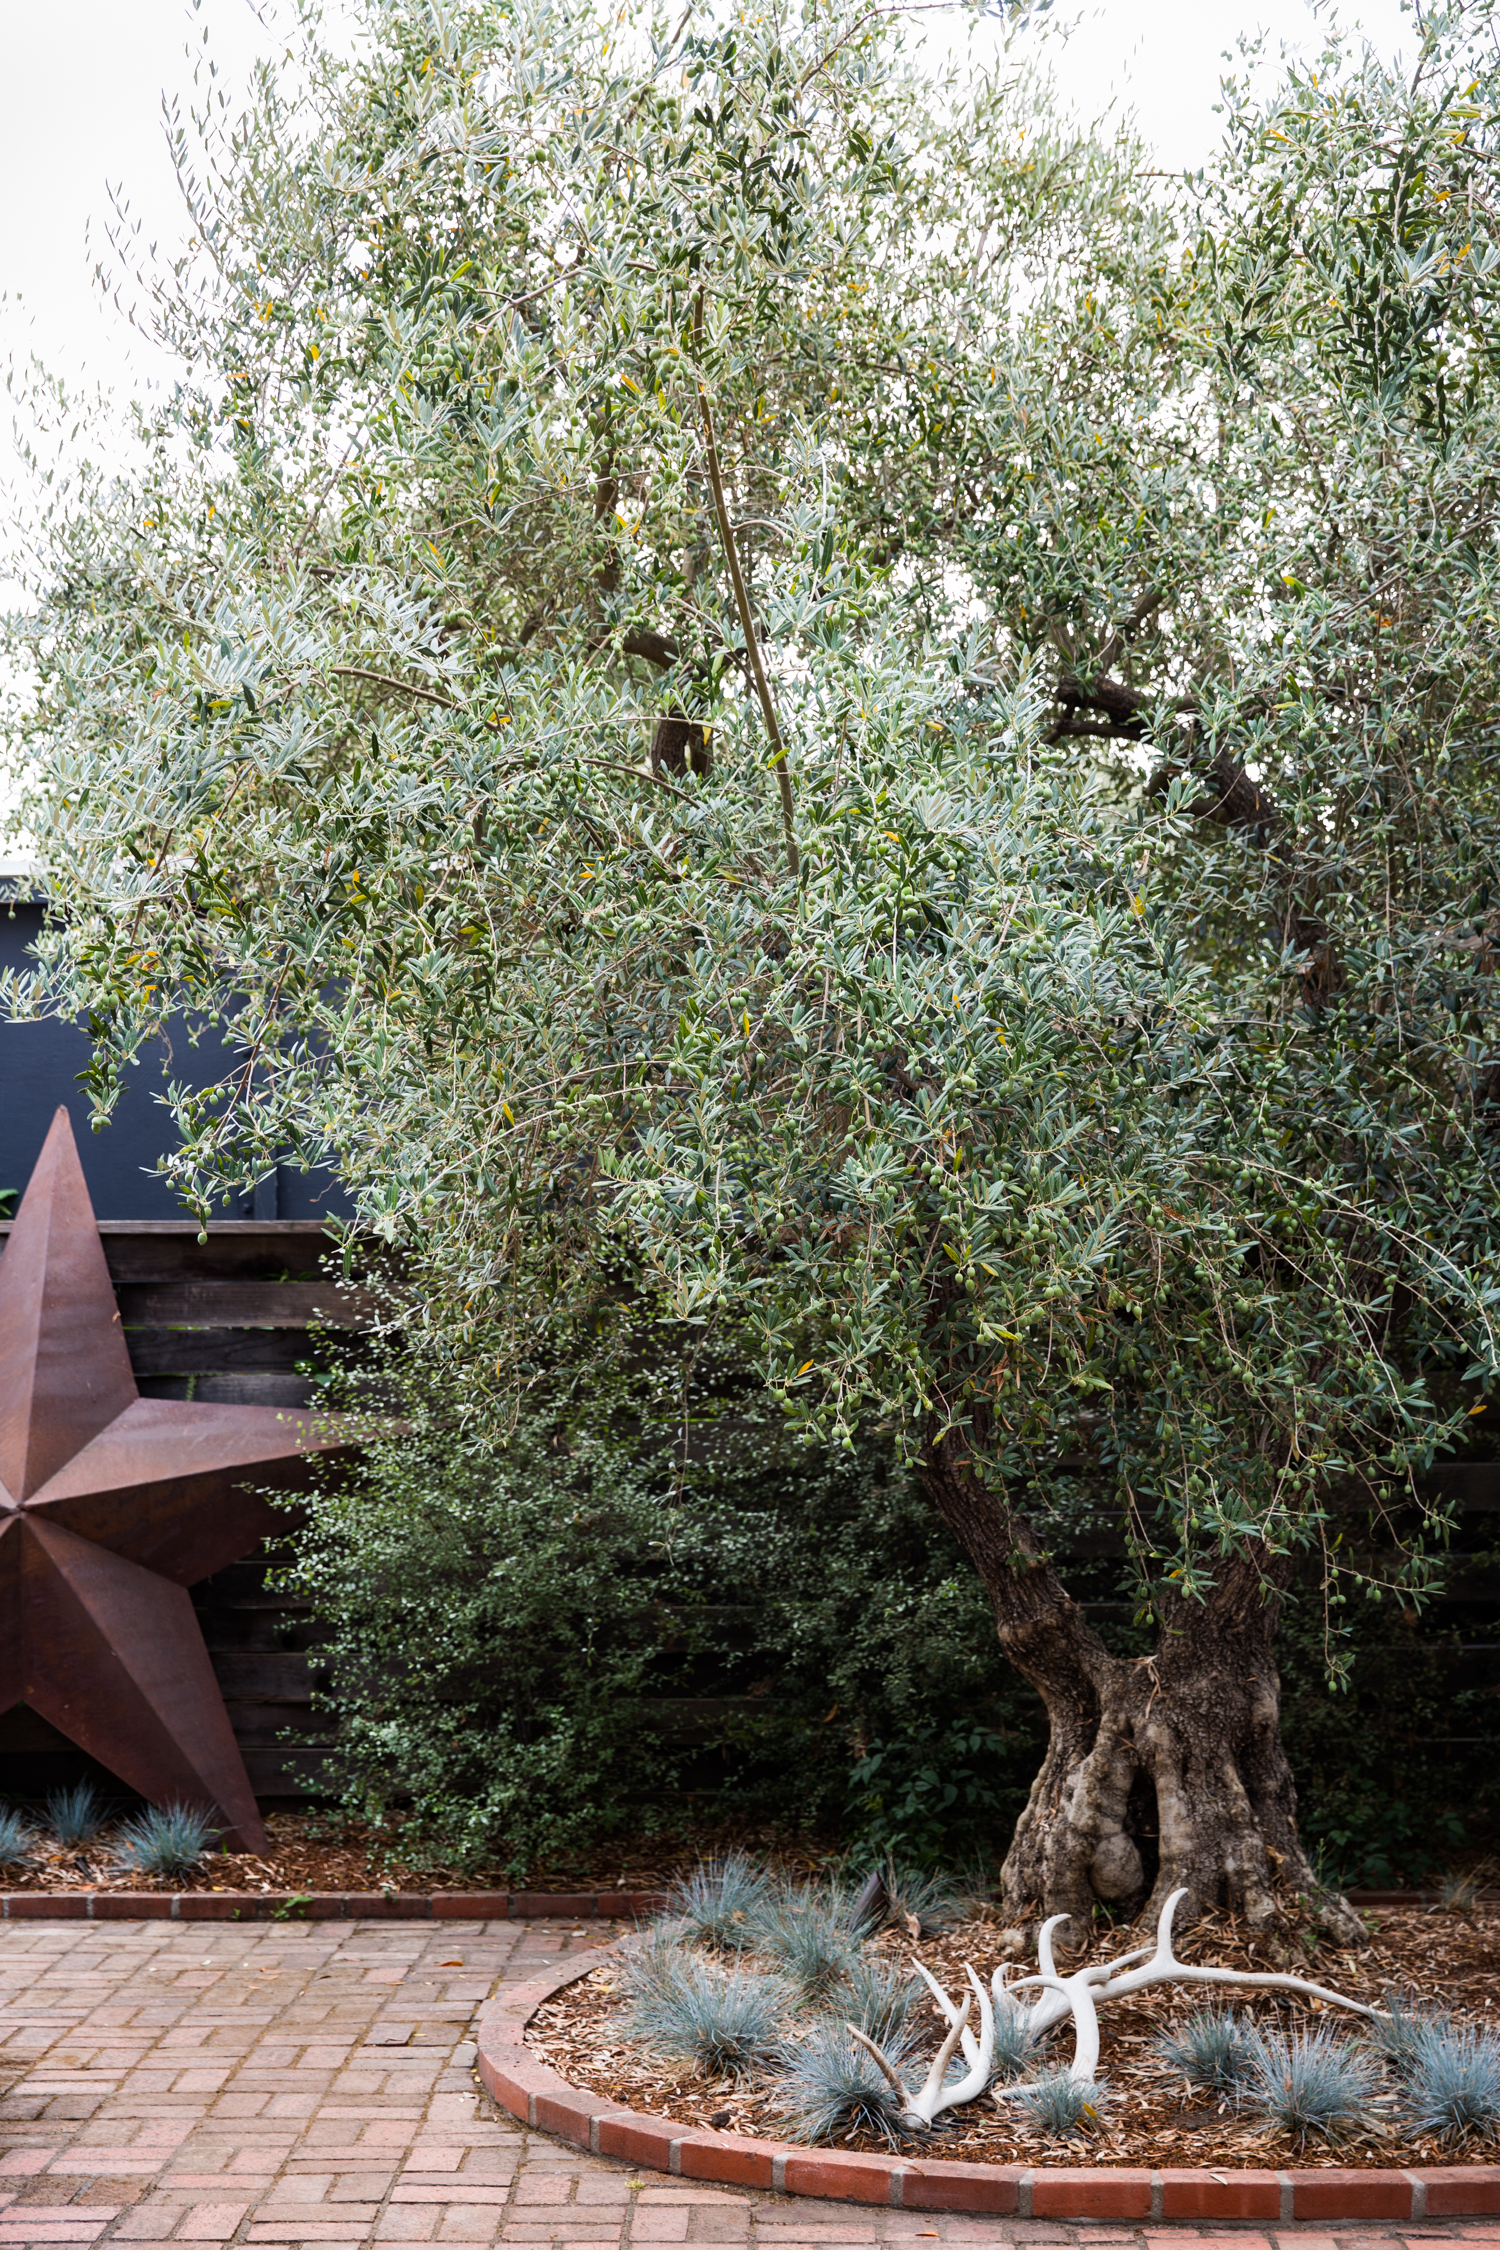 erinscottphotography_homesteaddesigncollective_sonomaproject-20.jpg